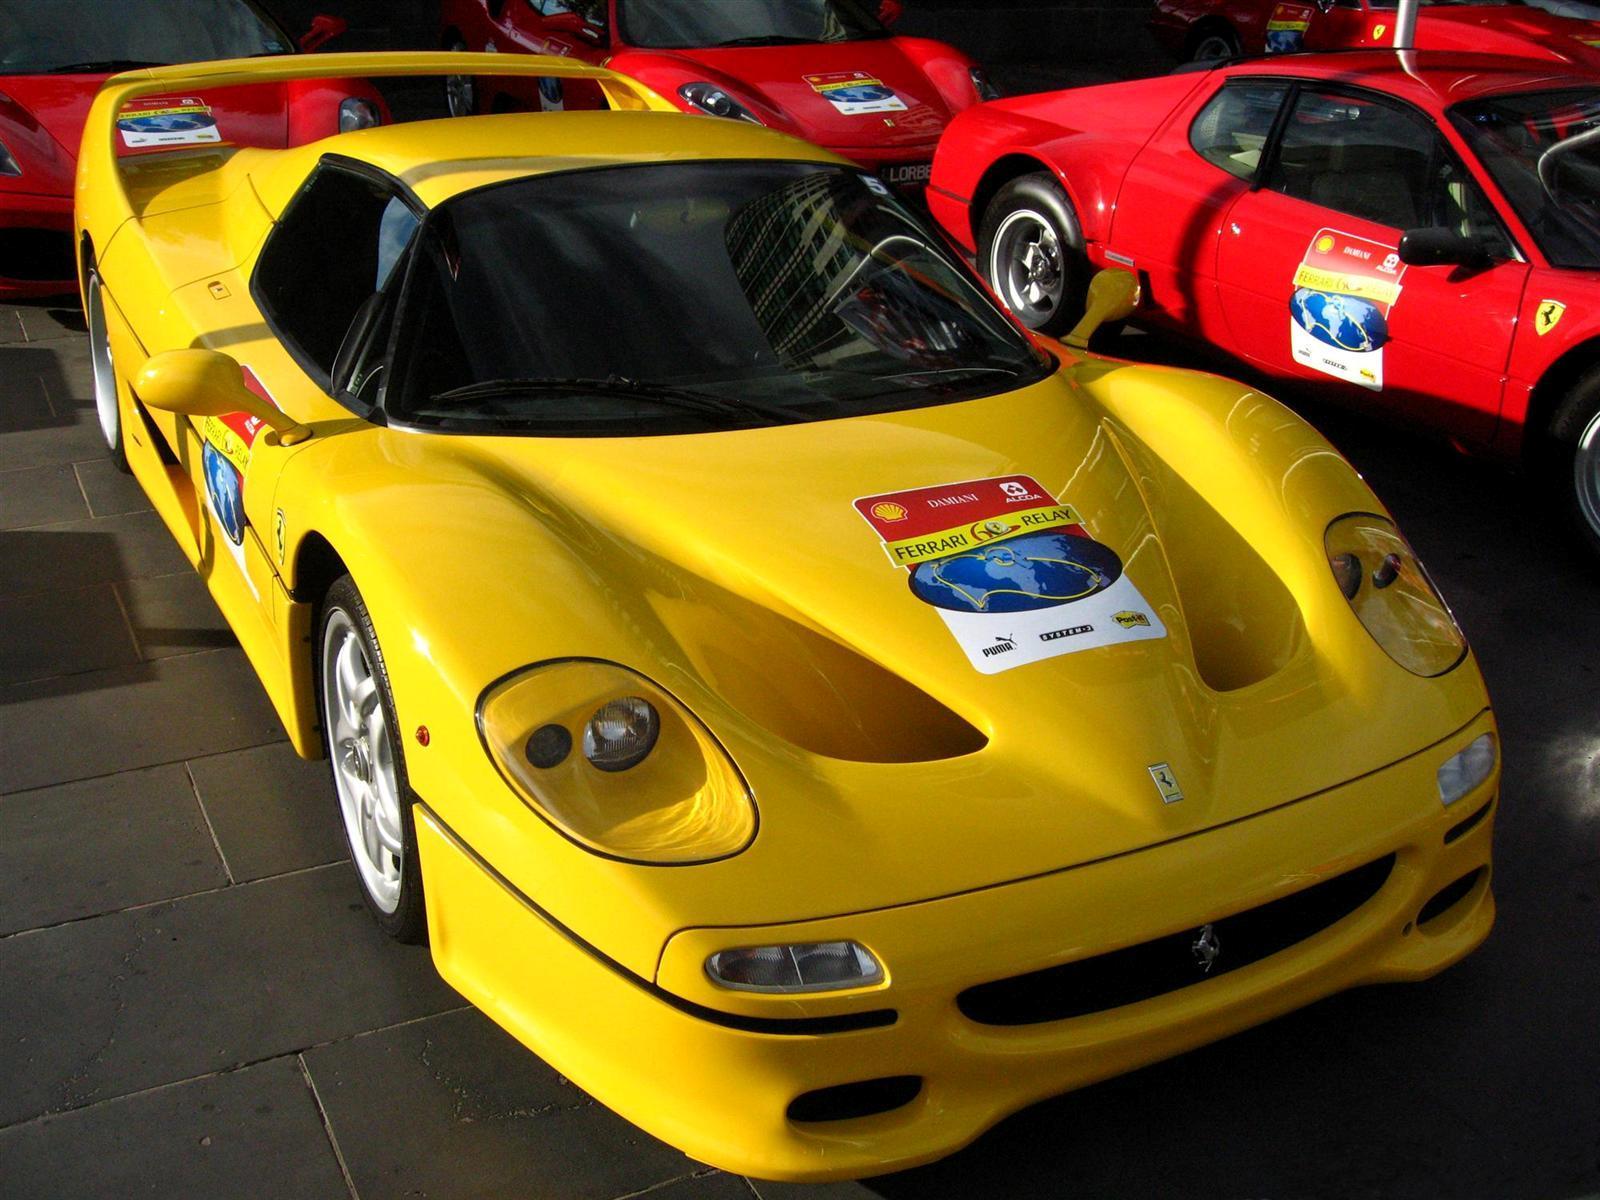 Ferrari F50 front (Crown